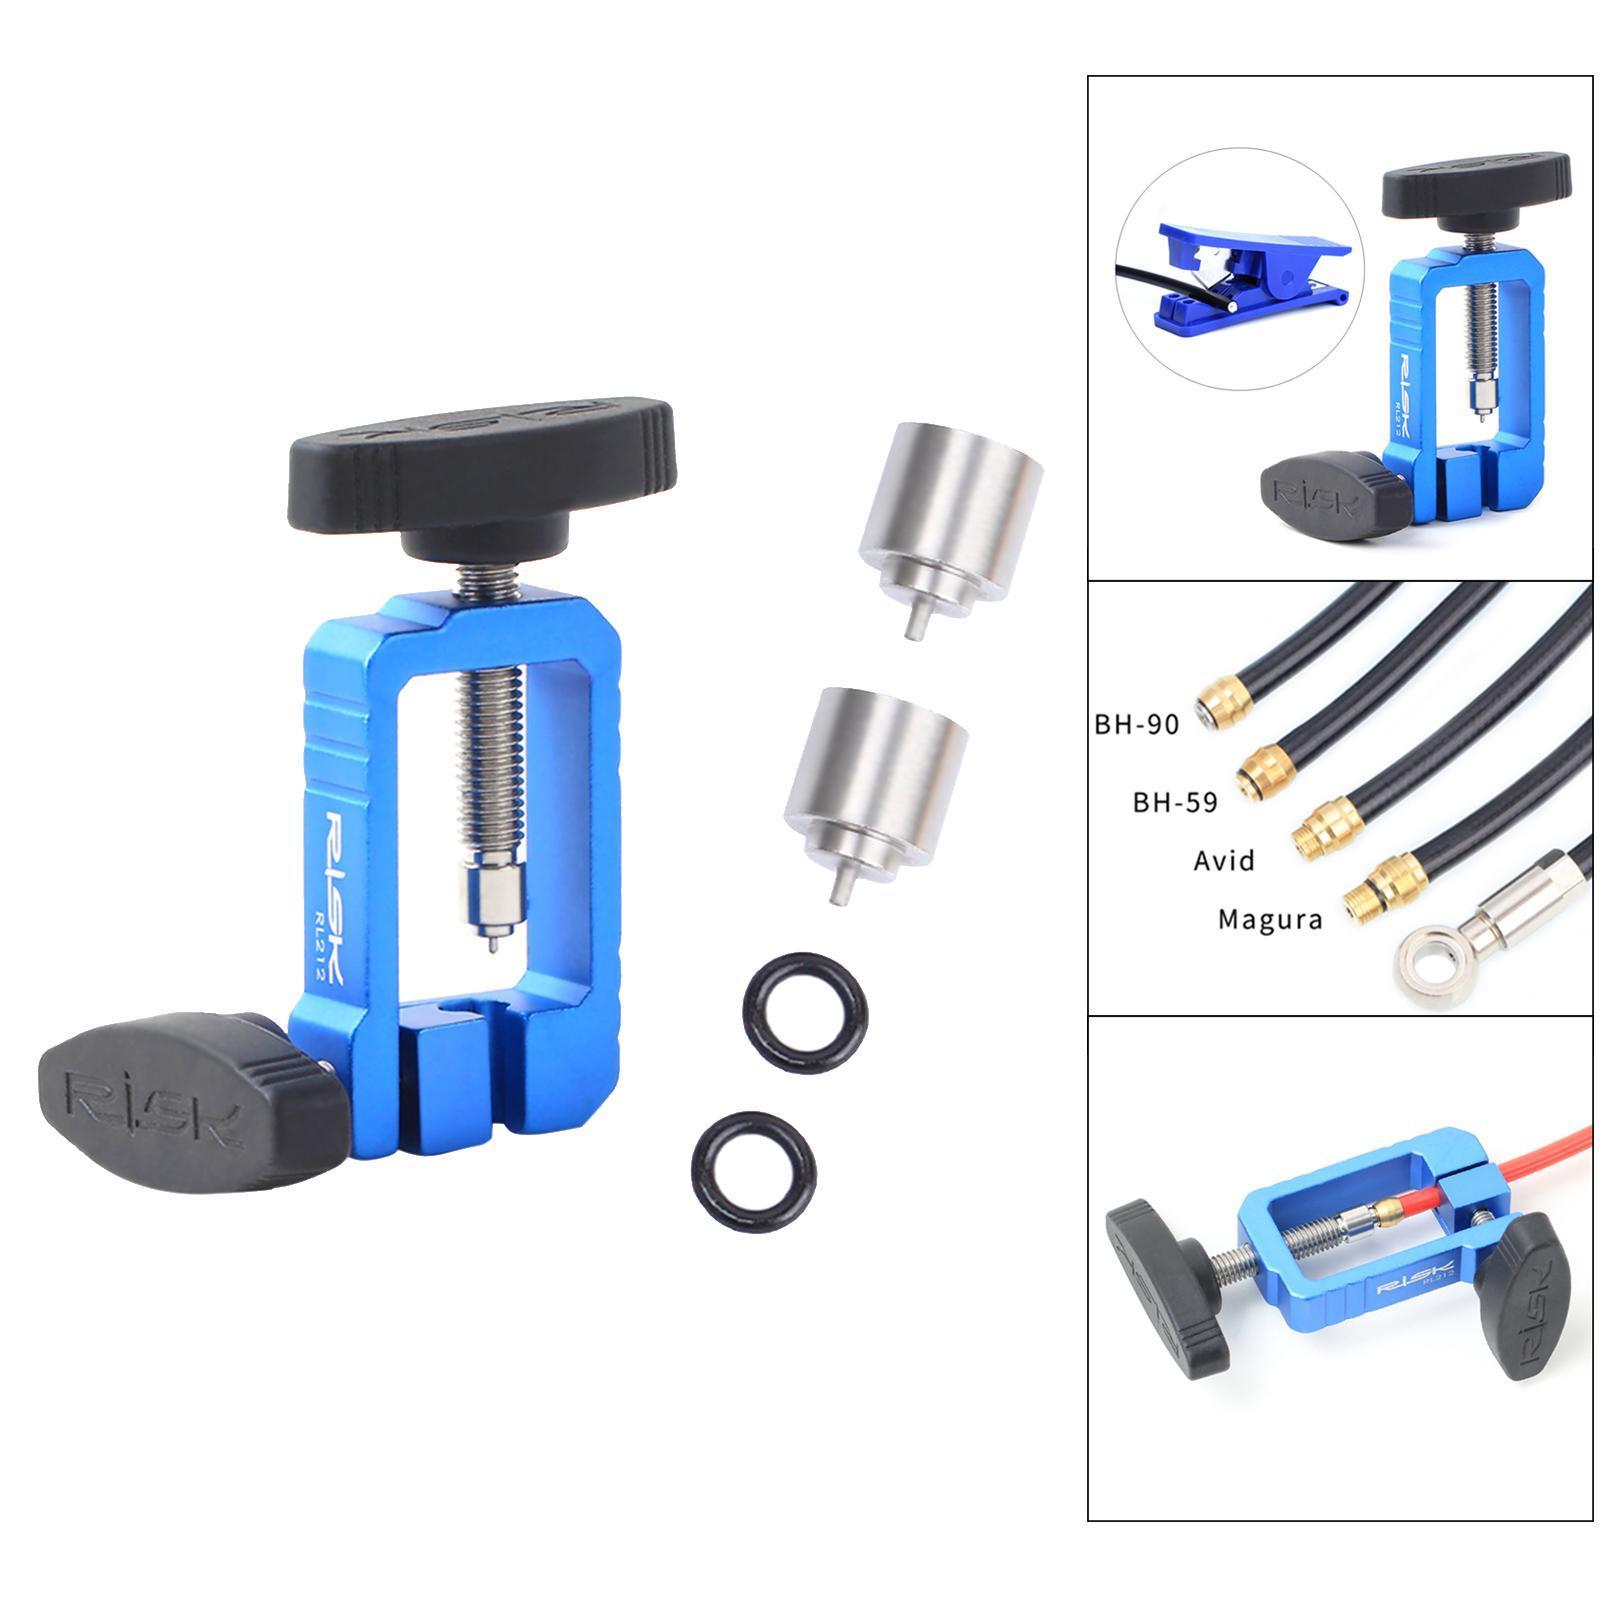 Bike Needle Driver Inserting Pressing Tool Hydraulic Hose Fitting Fix Tool